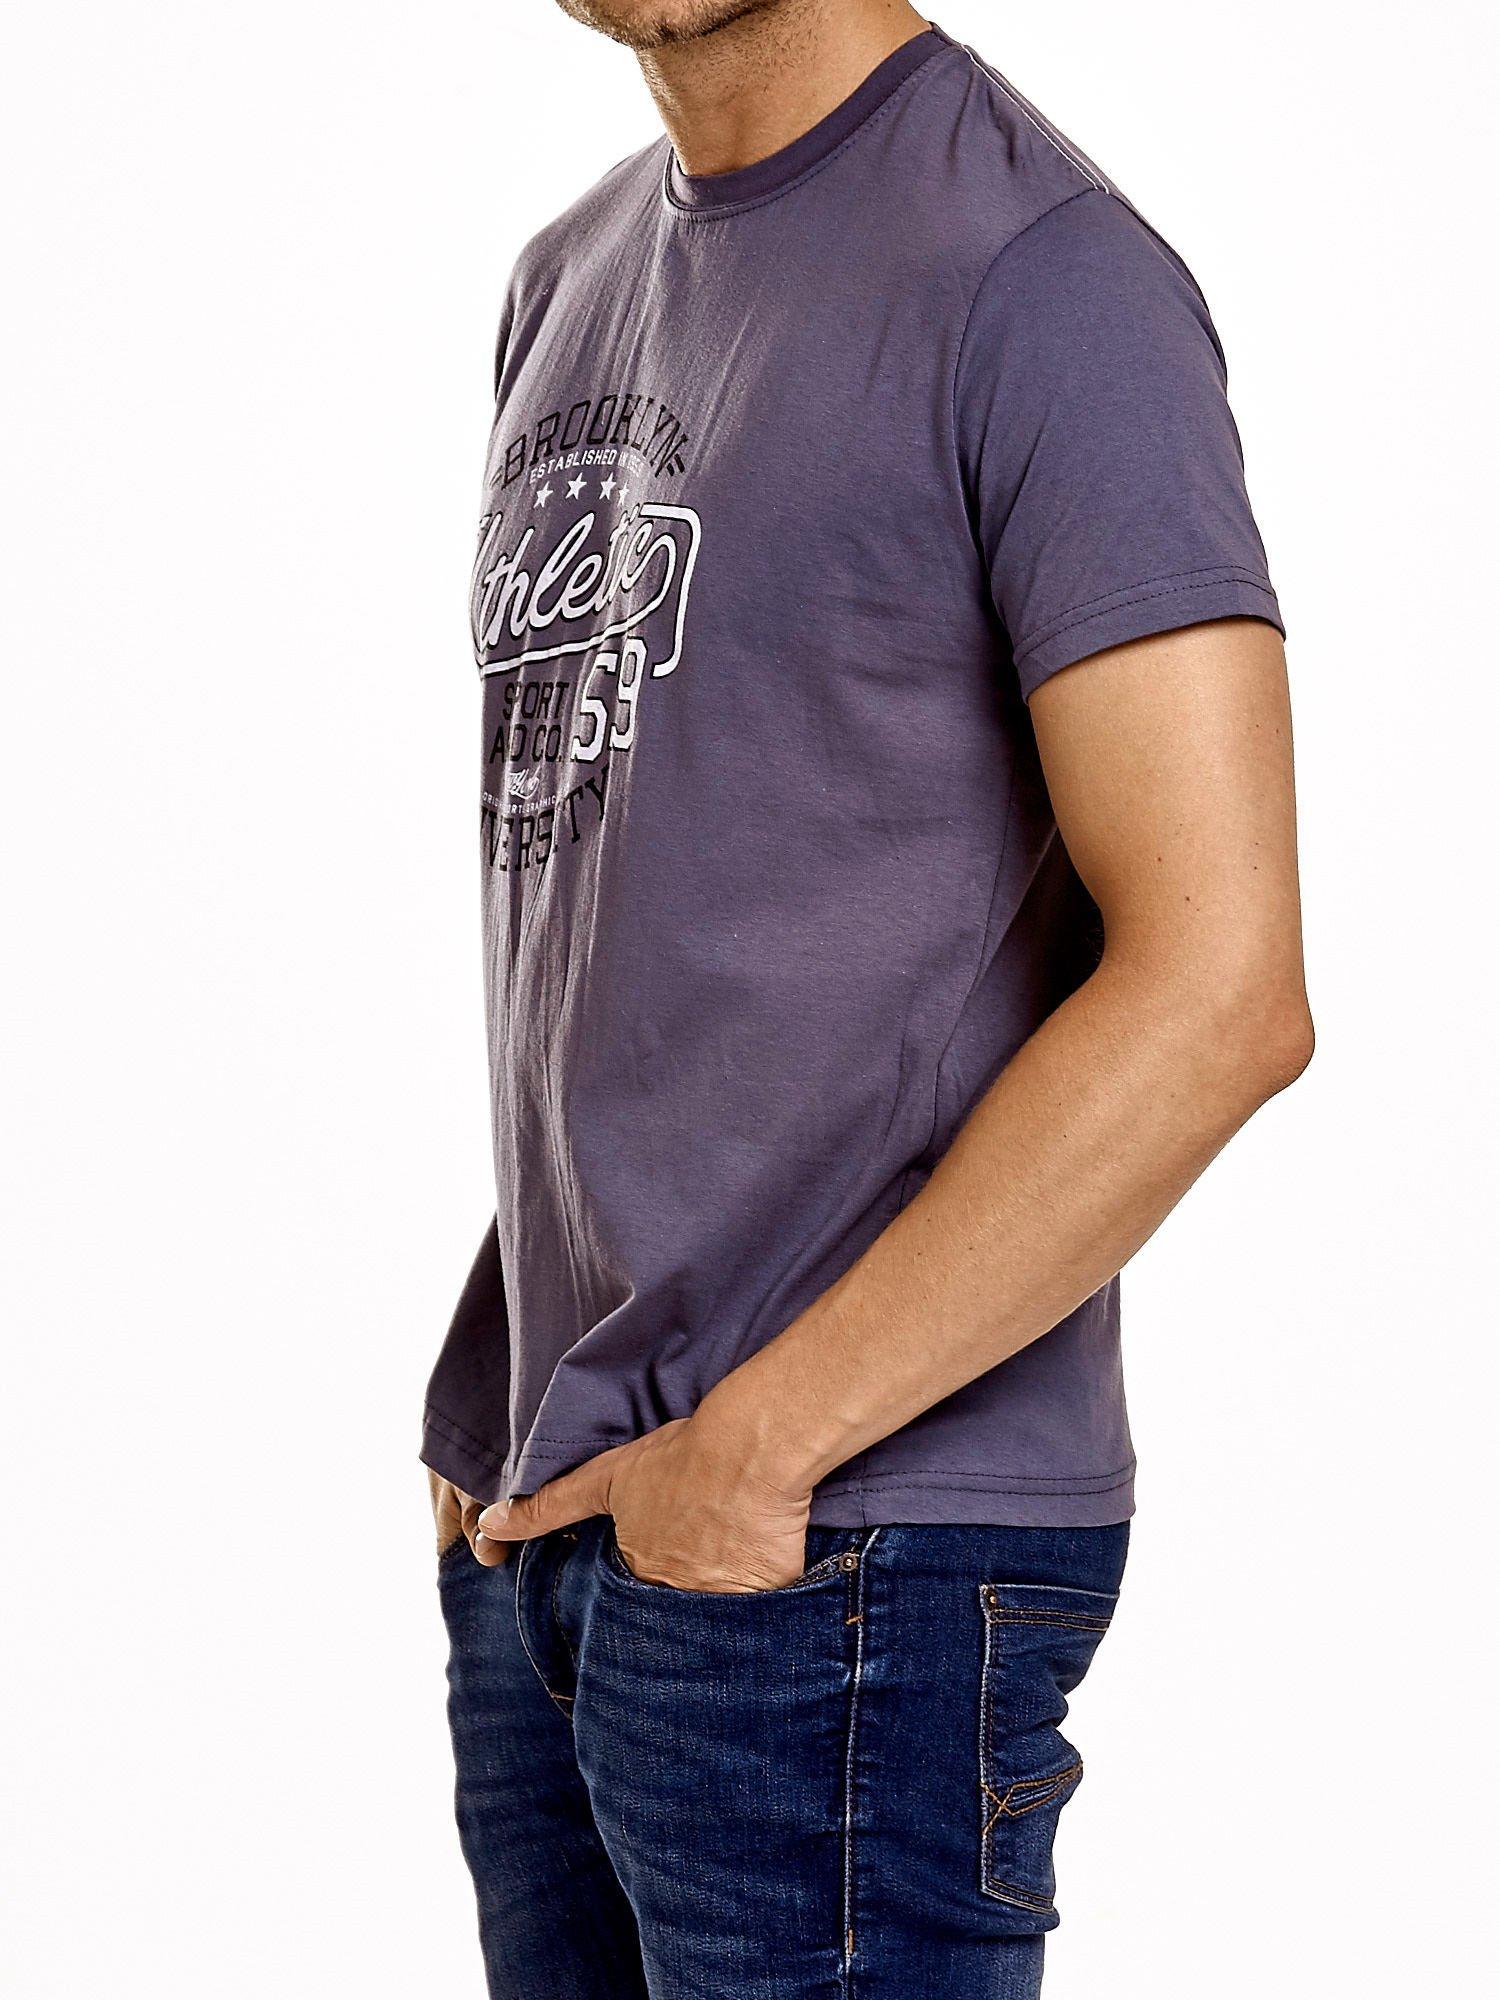 Ciemnoszary t-shirt męski z napisem BROOKLYN ATHLETIC UNIVERSITY                                  zdj.                                  4